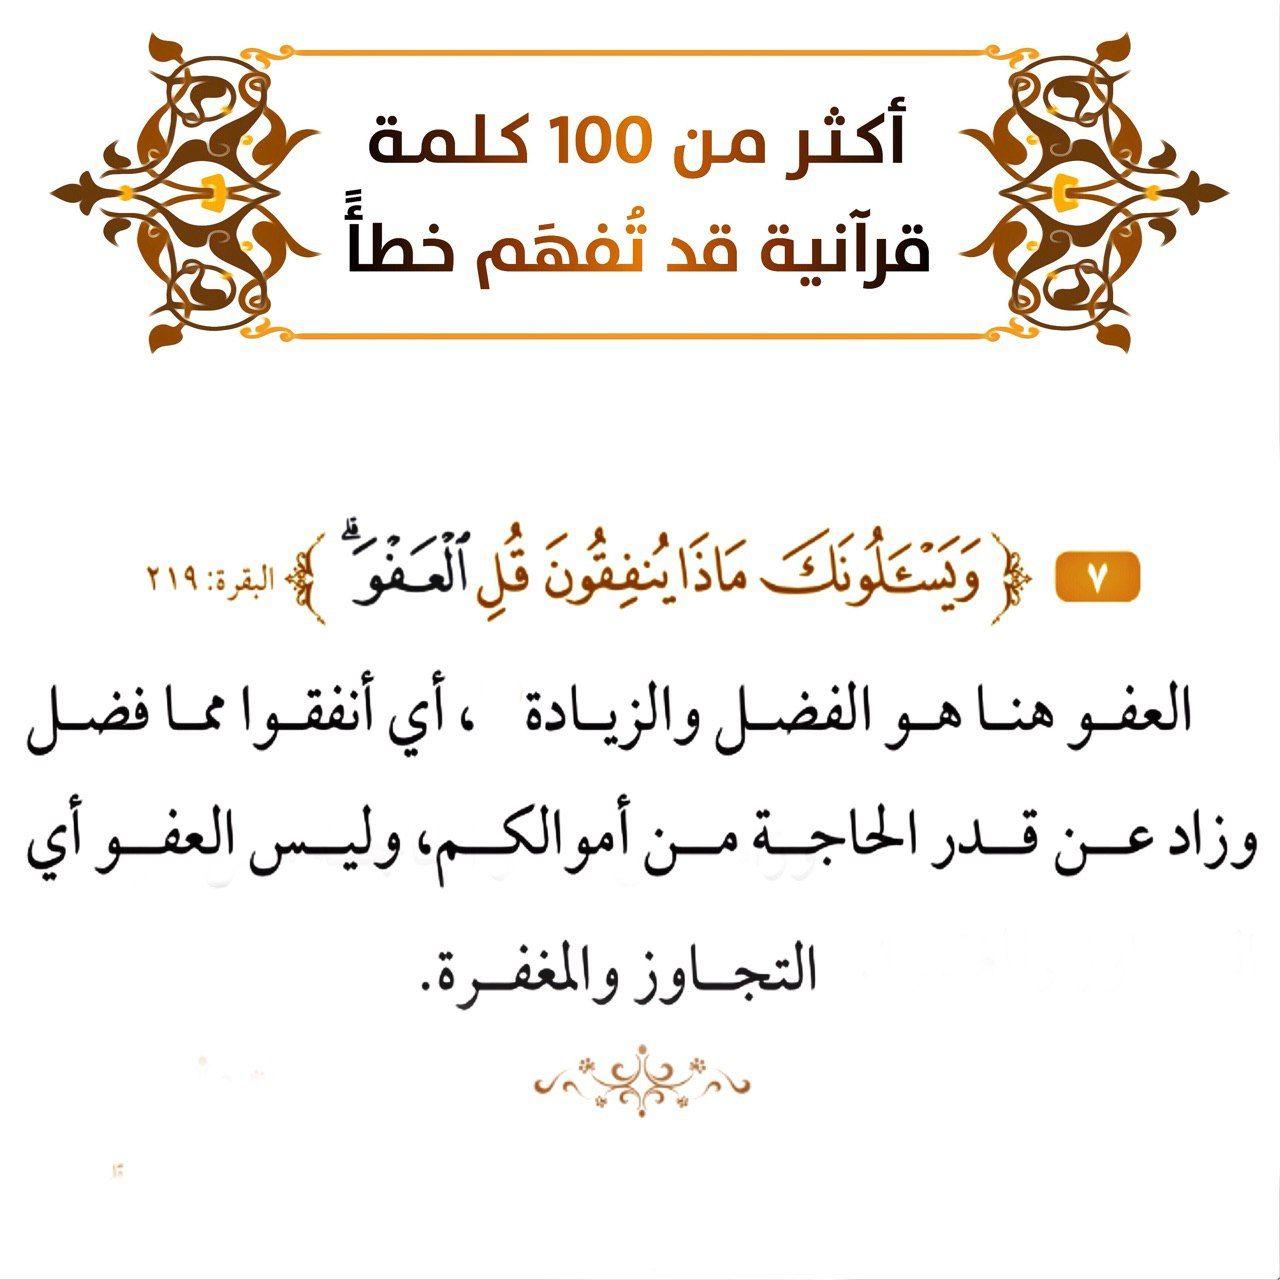 007 و ي سأ لون ك ماذا ي نف قون ق ل الع فو And They Ask You What They Should Spend Say The Excess Beyond Quran Quotes Quran Verses Islamic Quotes